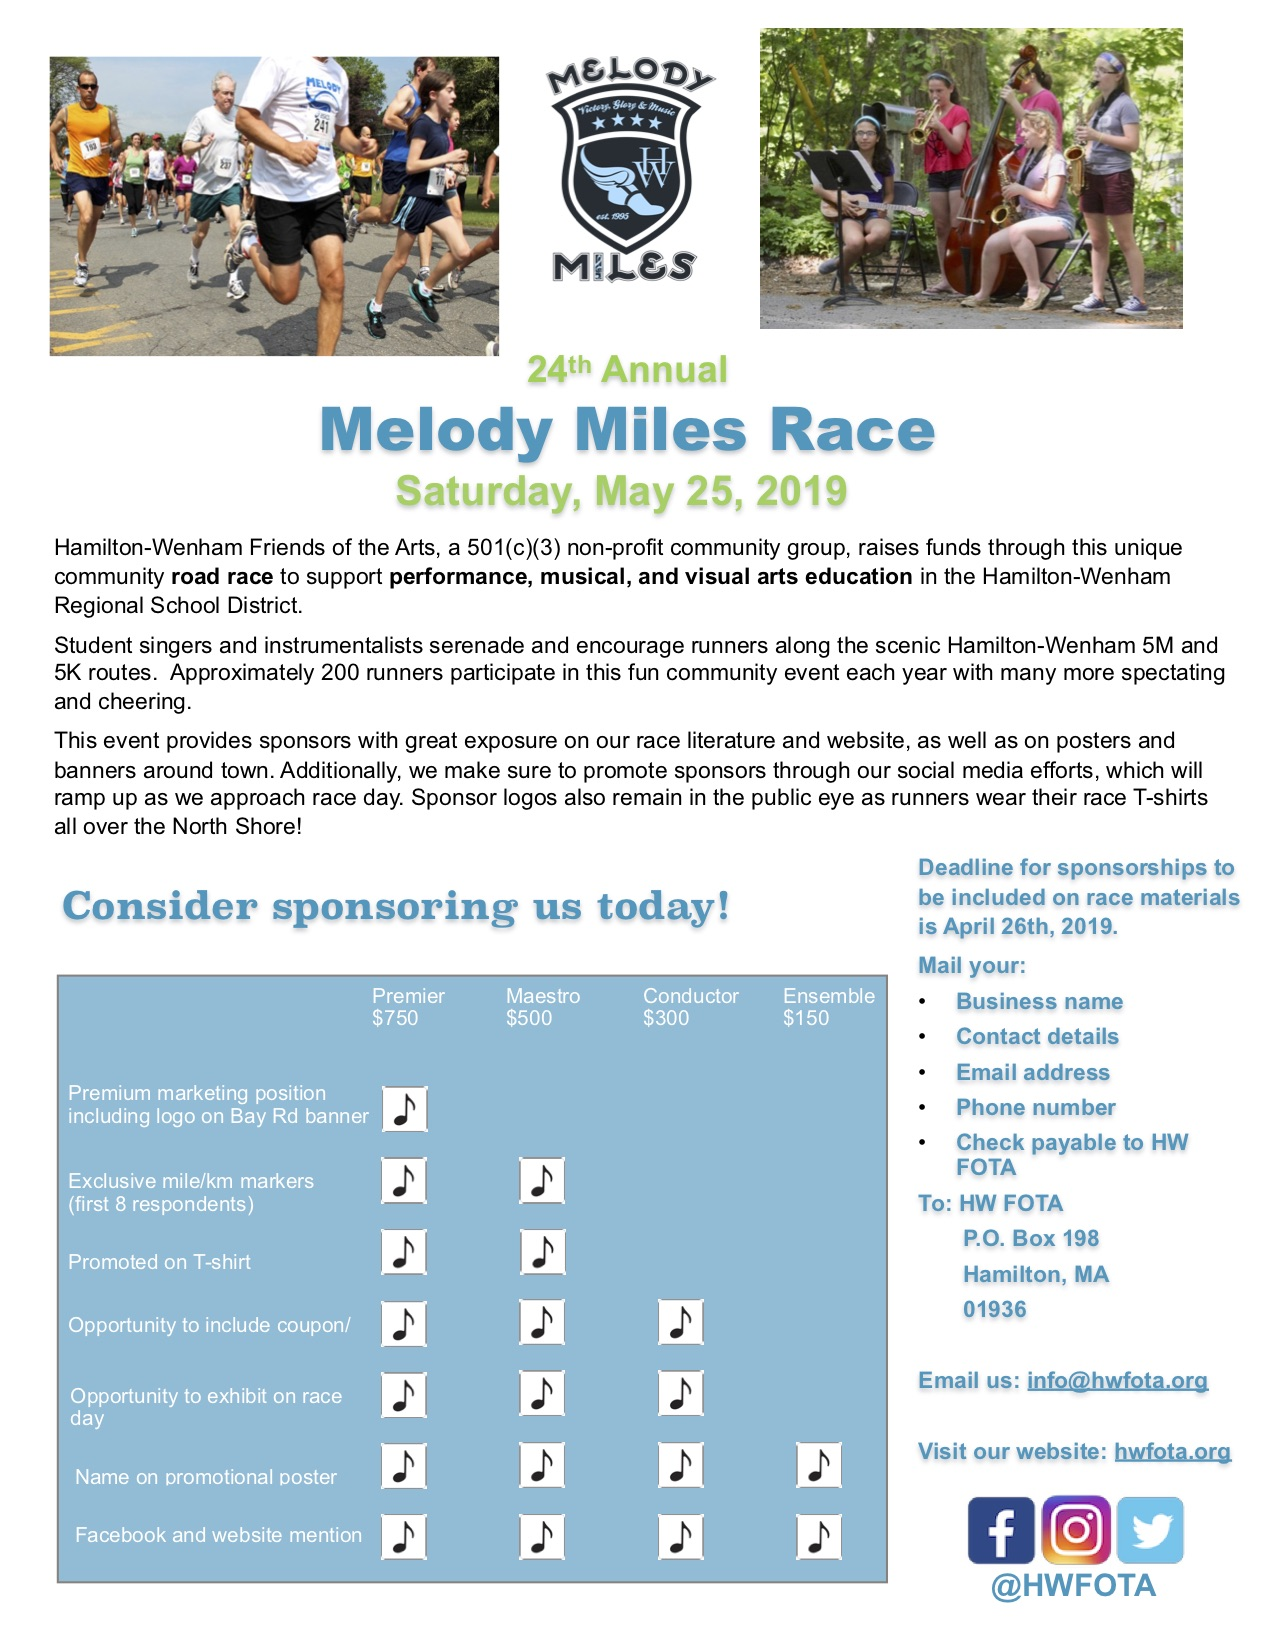 Melody Miles 2019 Sponsorship Flyer.jpg